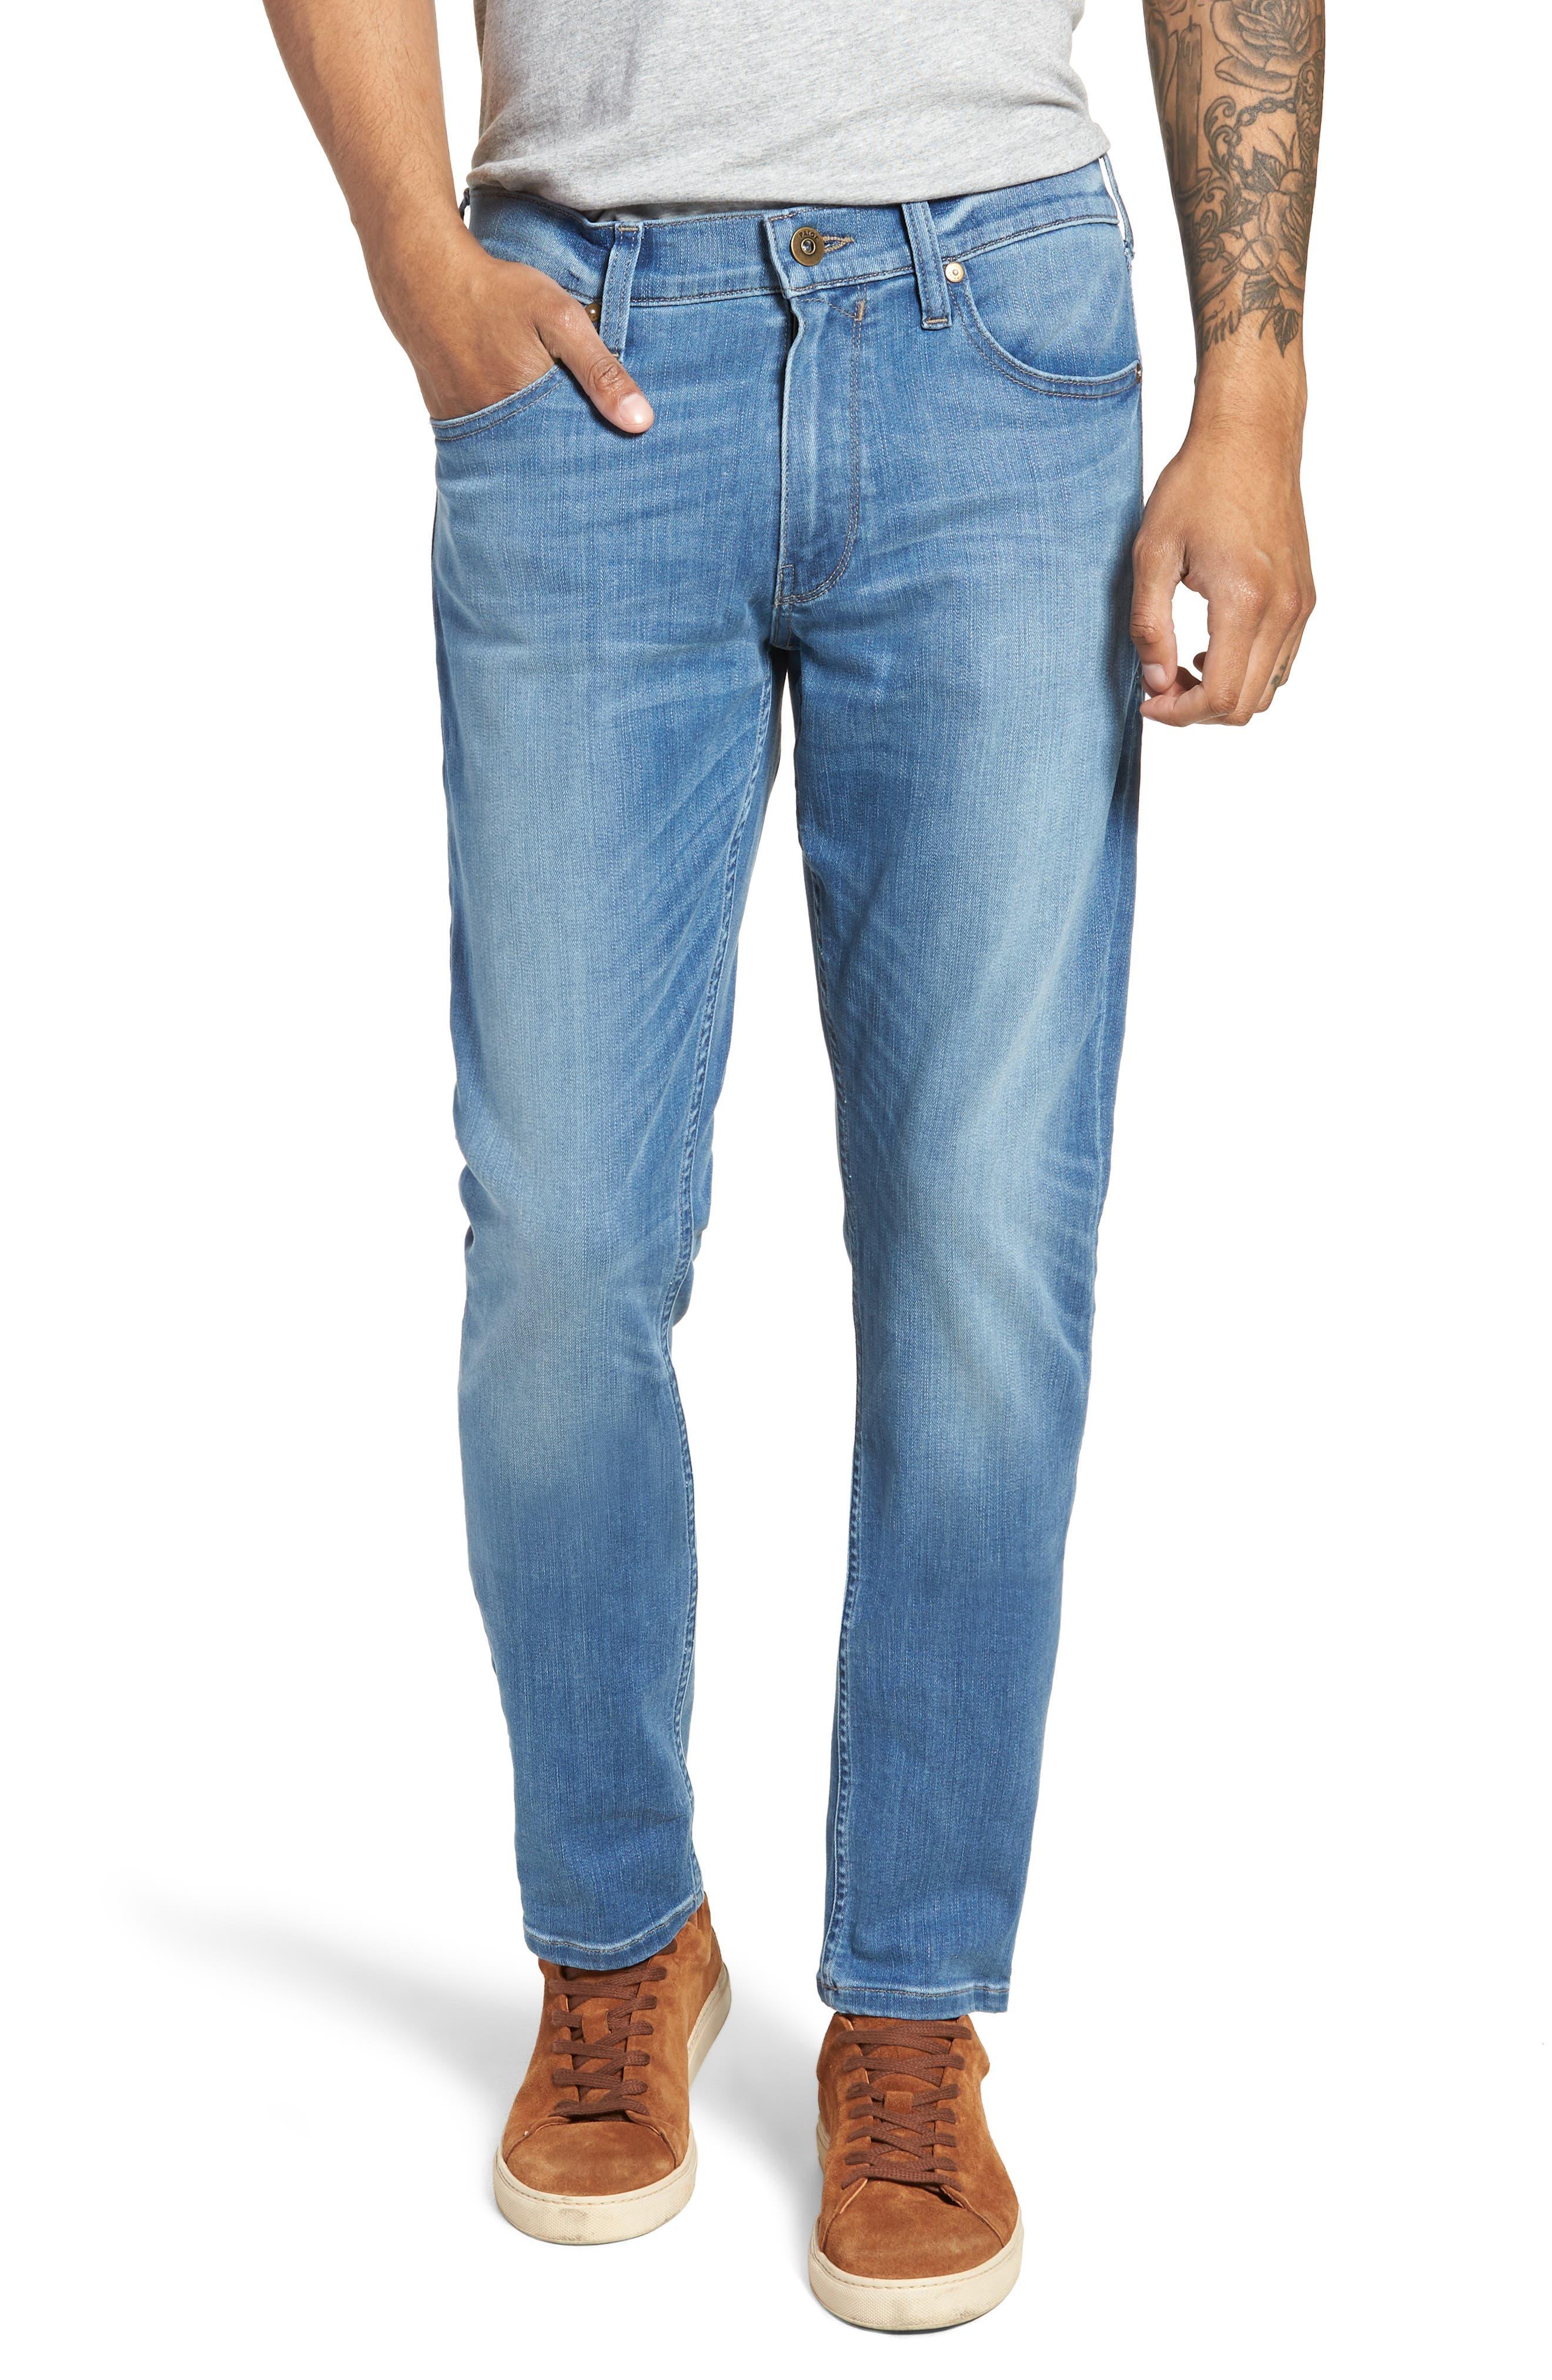 Transcend - Federal Slim Straight Leg Jeans,                             Main thumbnail 1, color,                             Hammonds